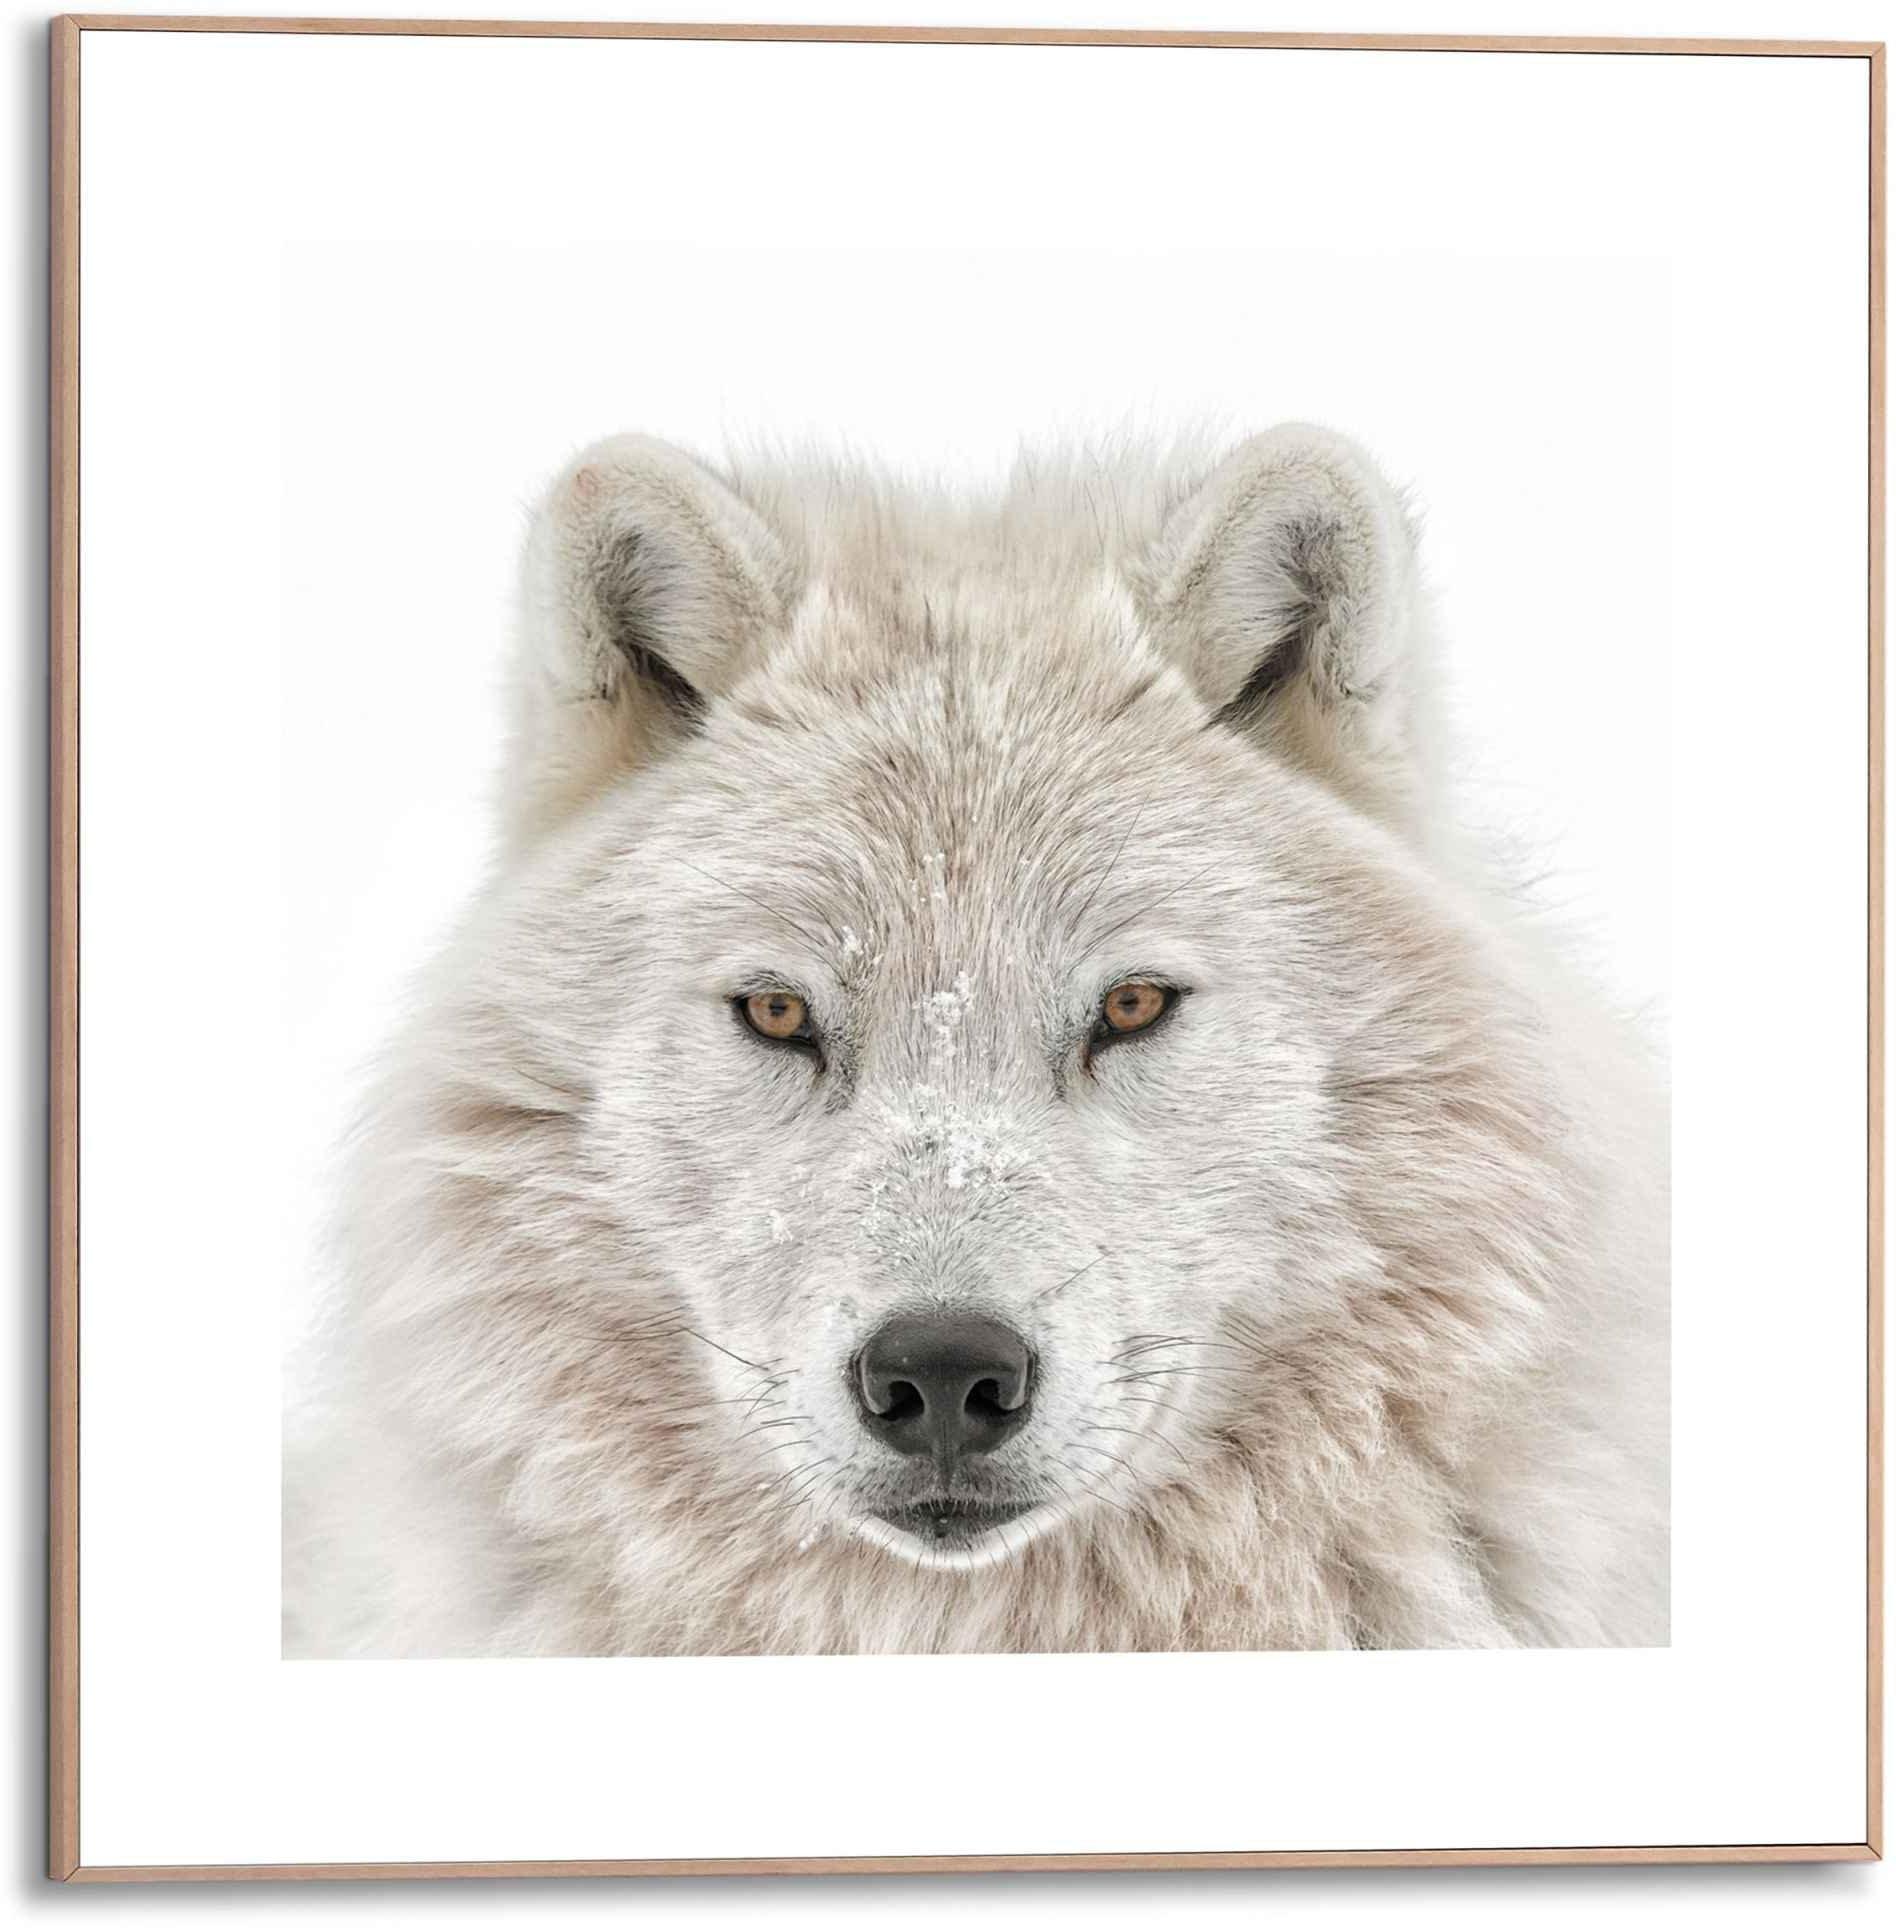 Reinders! artprint Ingelijste print wolf (1 stuk) - verschillende betaalmethodes